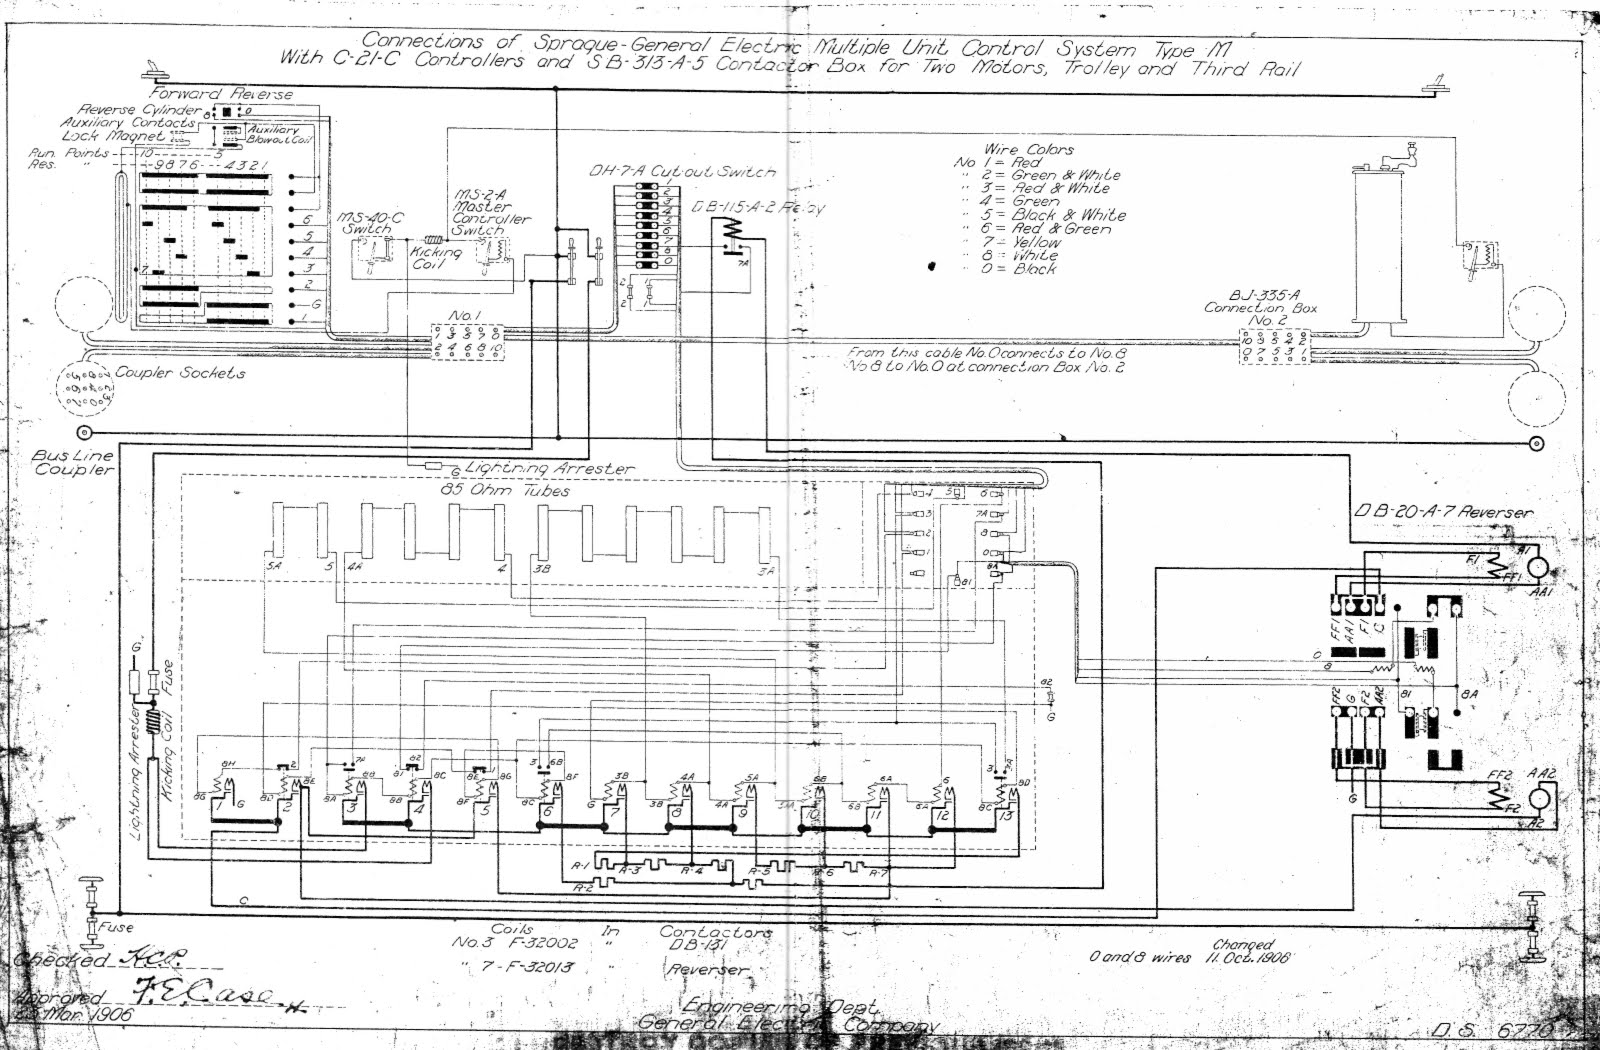 skoda citigo wiring diagram wiring schematic diagram www guenstige entruempelung berlin de [ 1600 x 1050 Pixel ]